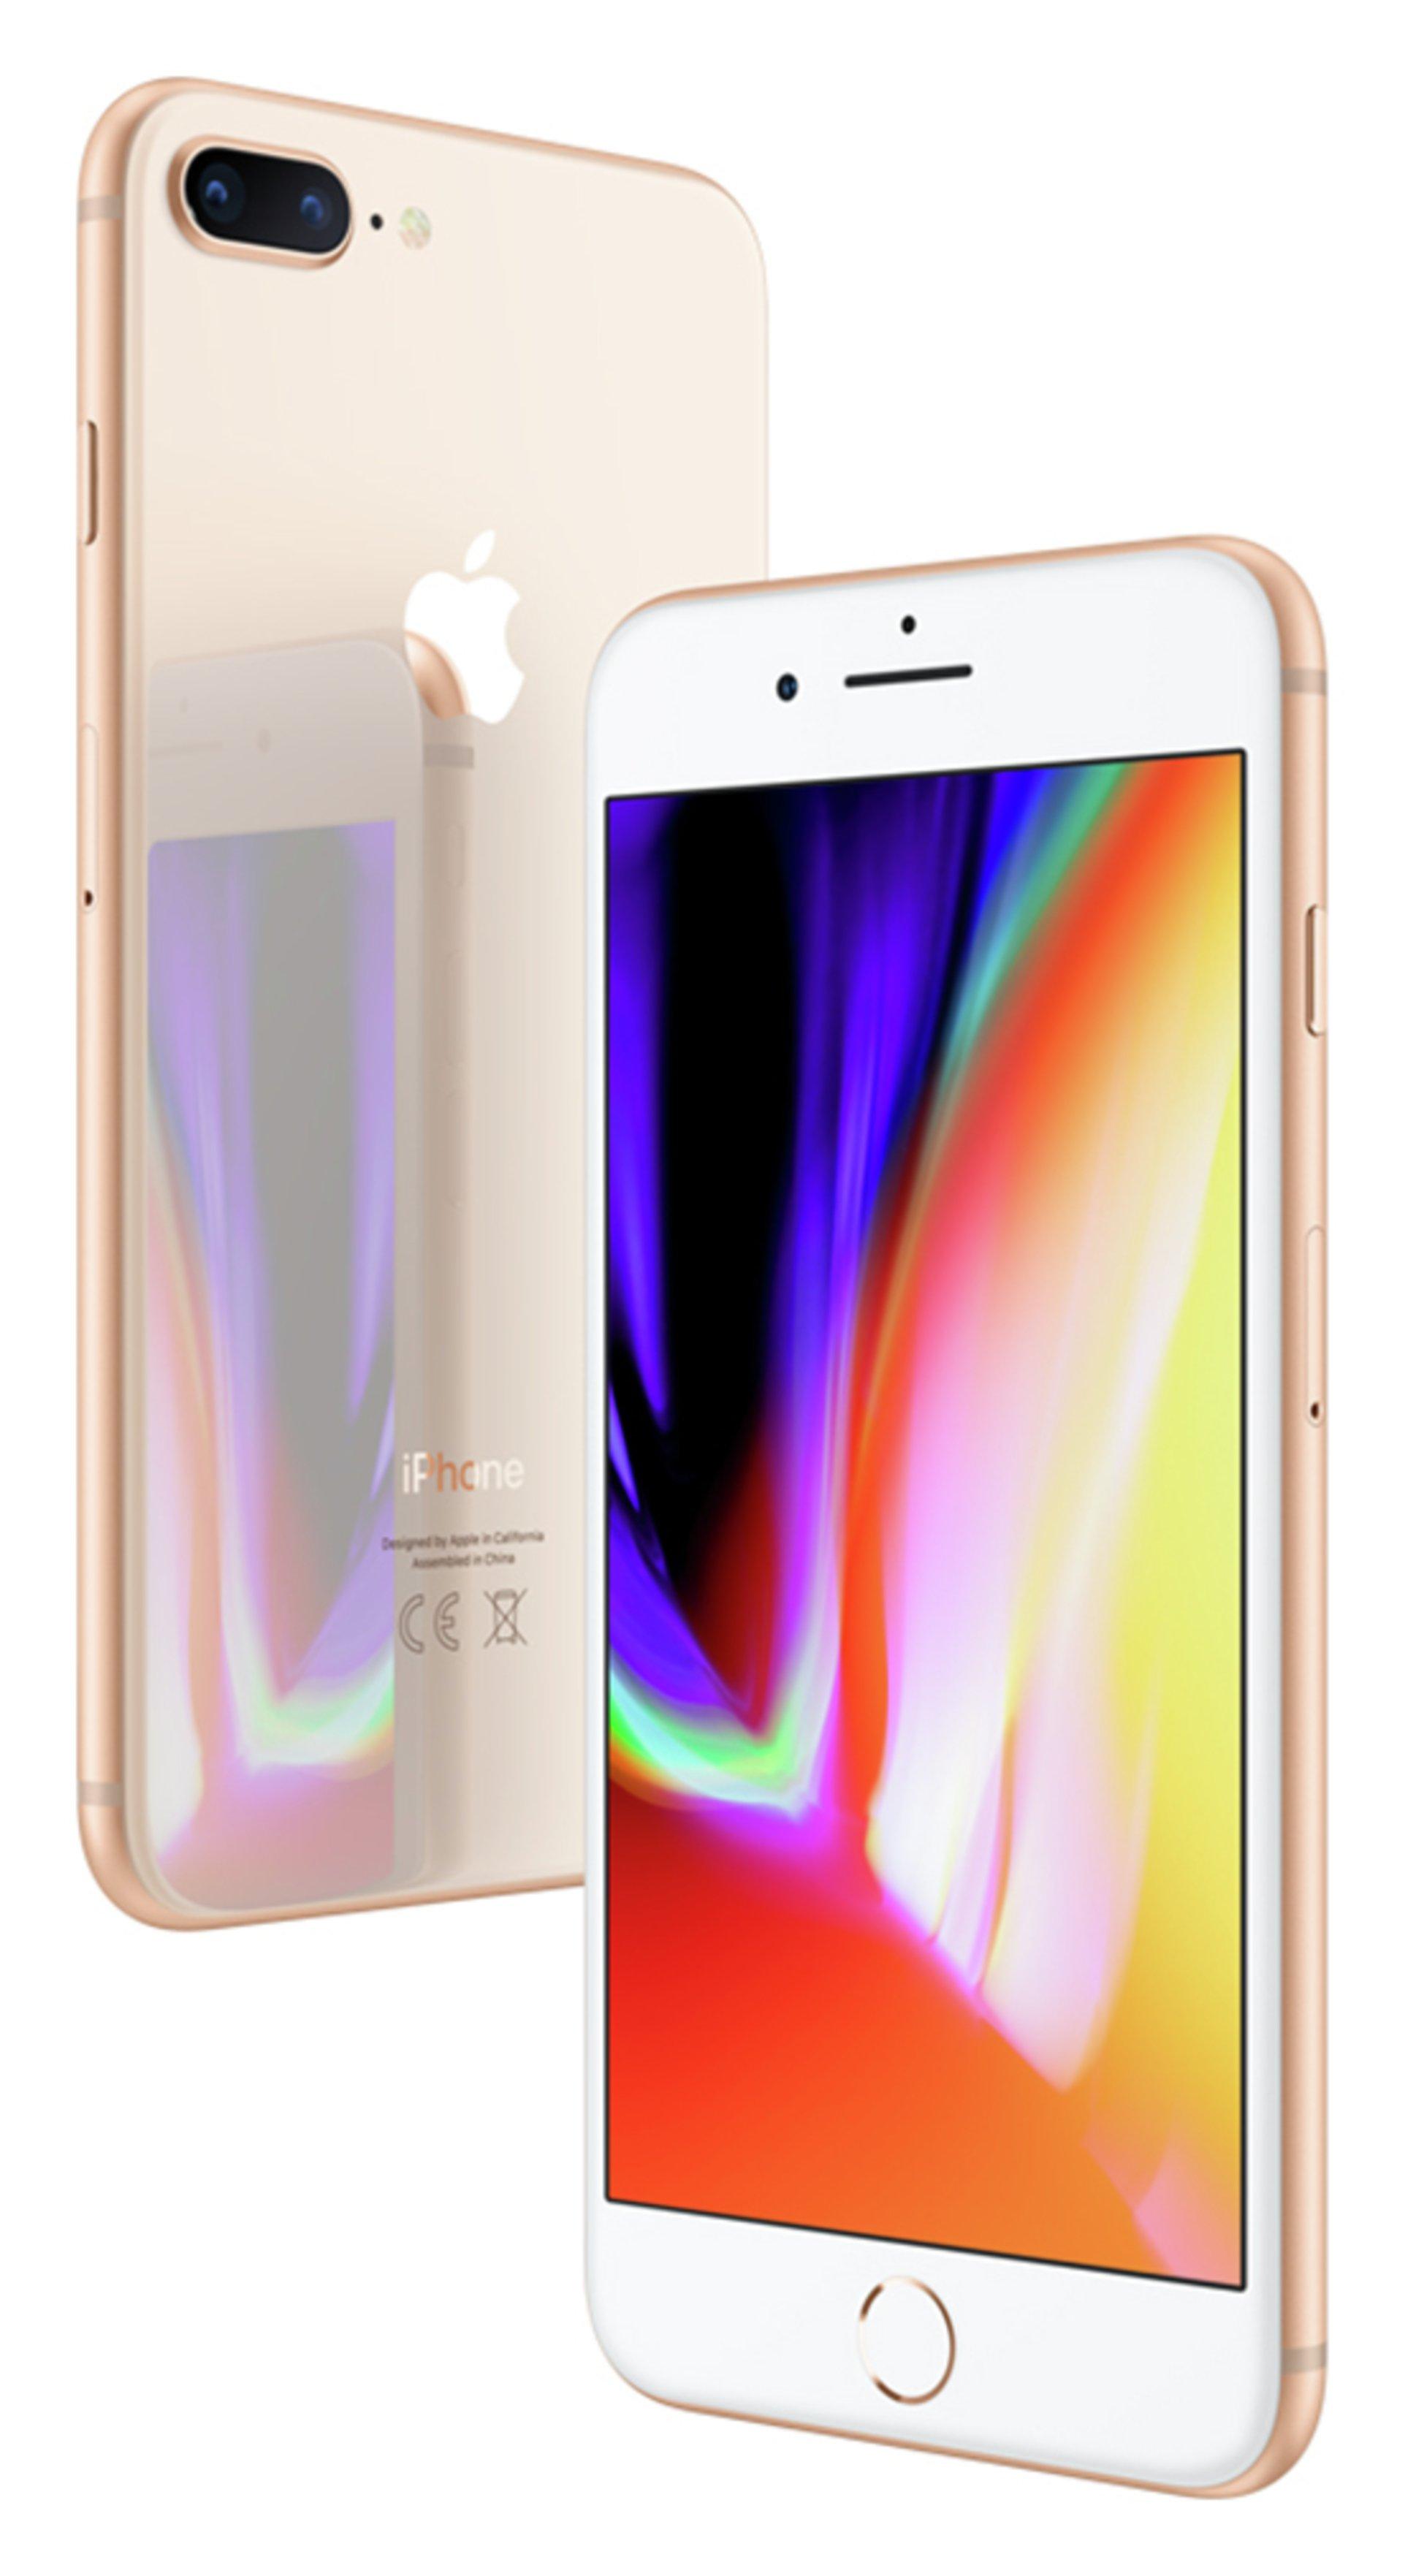 Apple Sim Free iPhone 8 Plus 64GB Mobile Phone - Gold